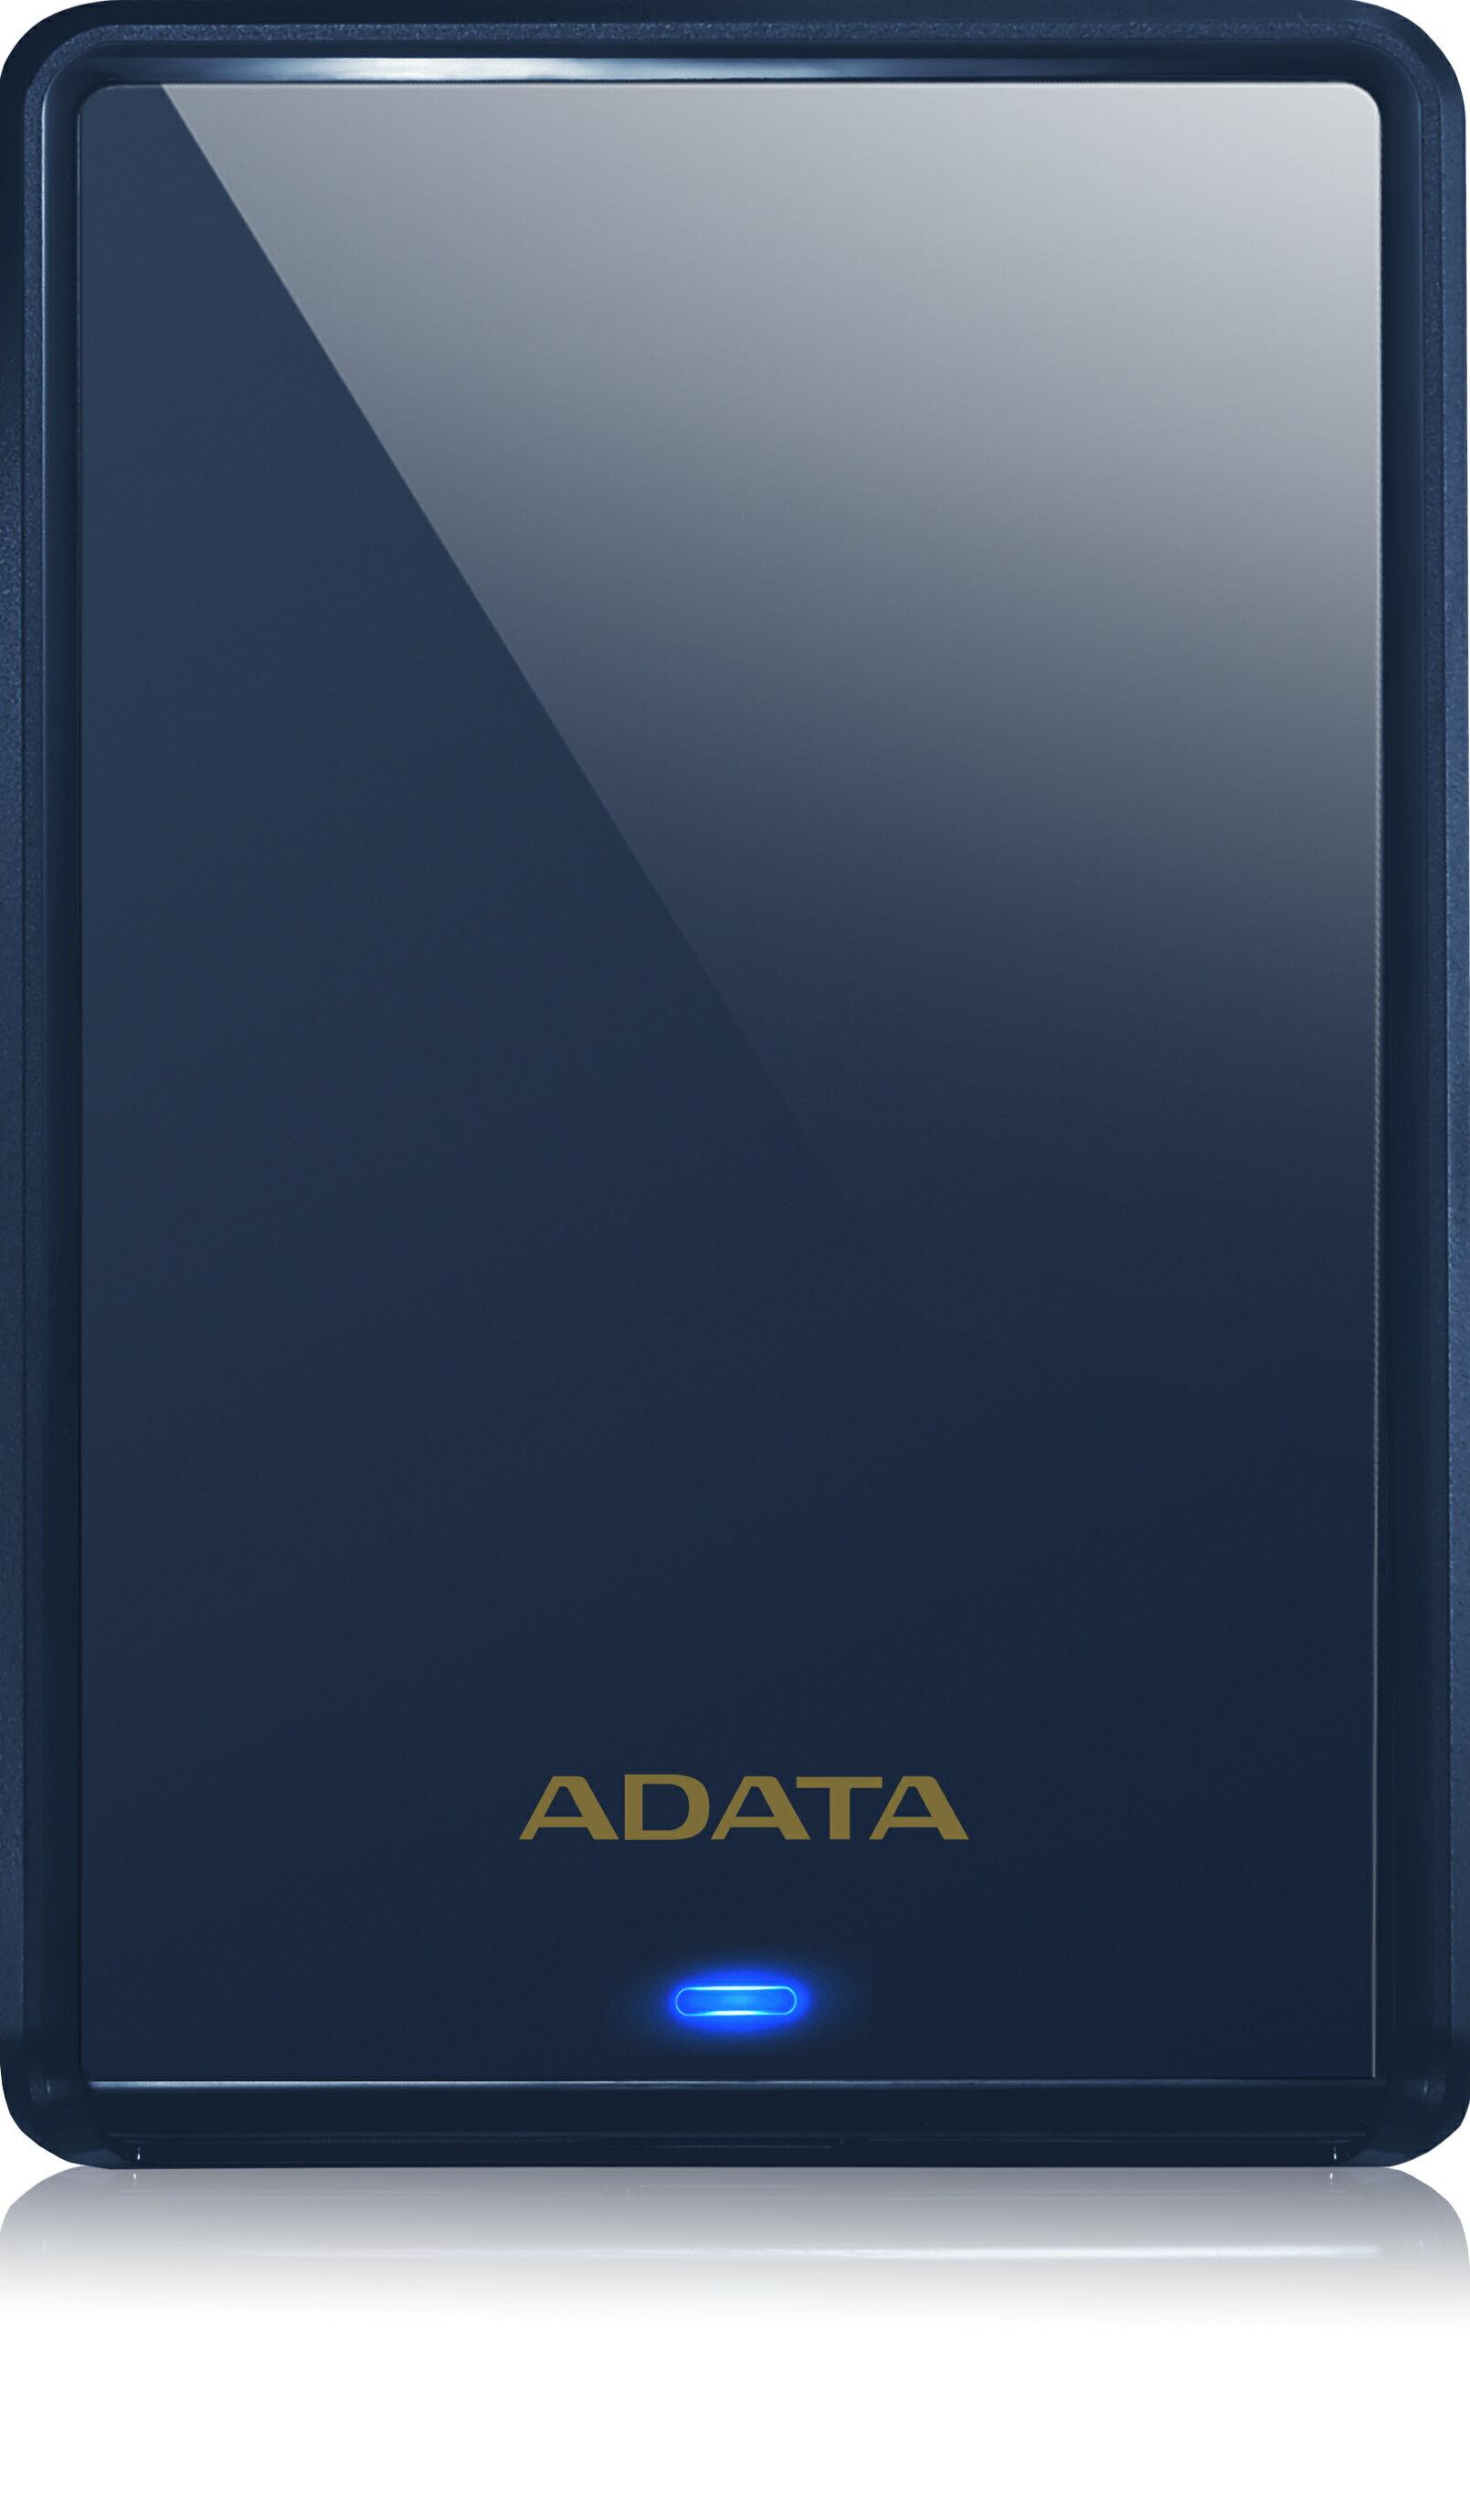 ADATA HV620S Slim USB 3.0 External HDD 1TB - Blue (AHV620S-1TU3-CBL) 1